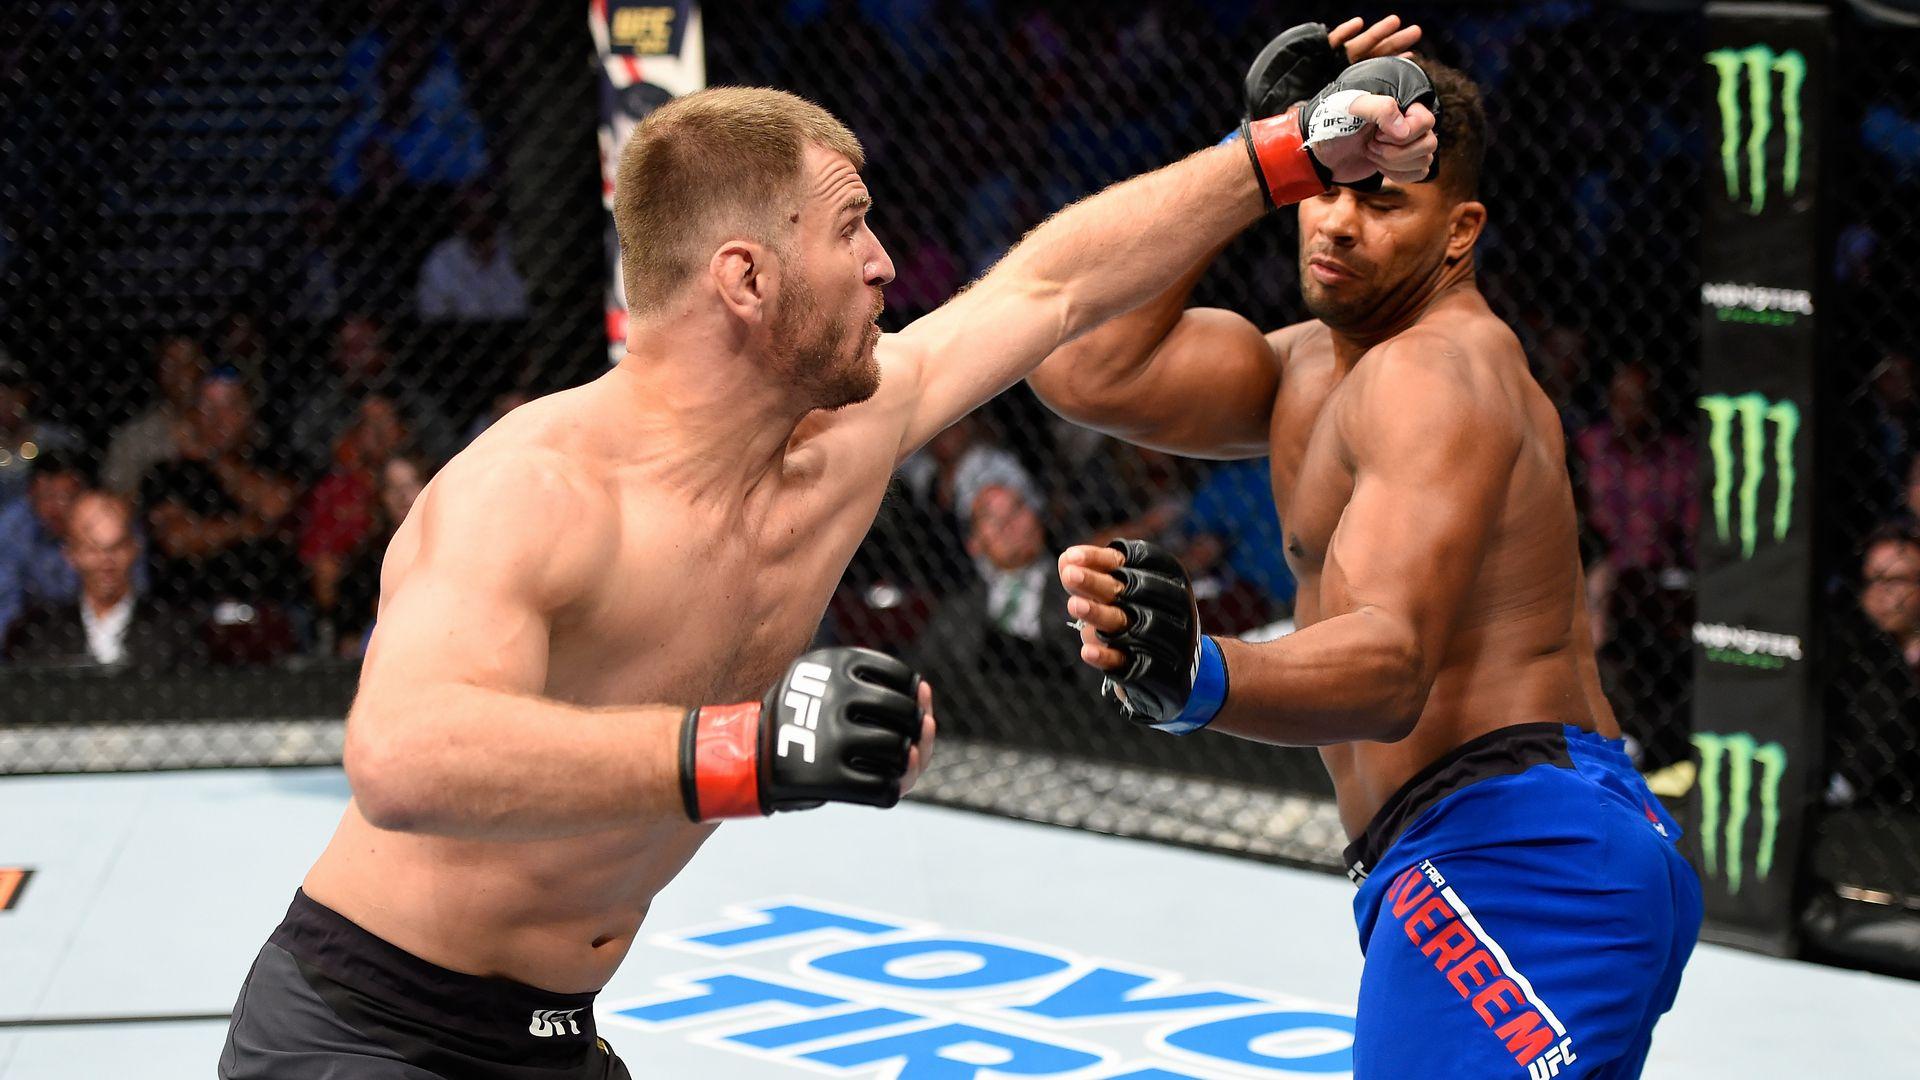 【UFC】スティペ・ミオシッチ vs. アリスター・オーフレイム(今日は何の日:9月11日編)